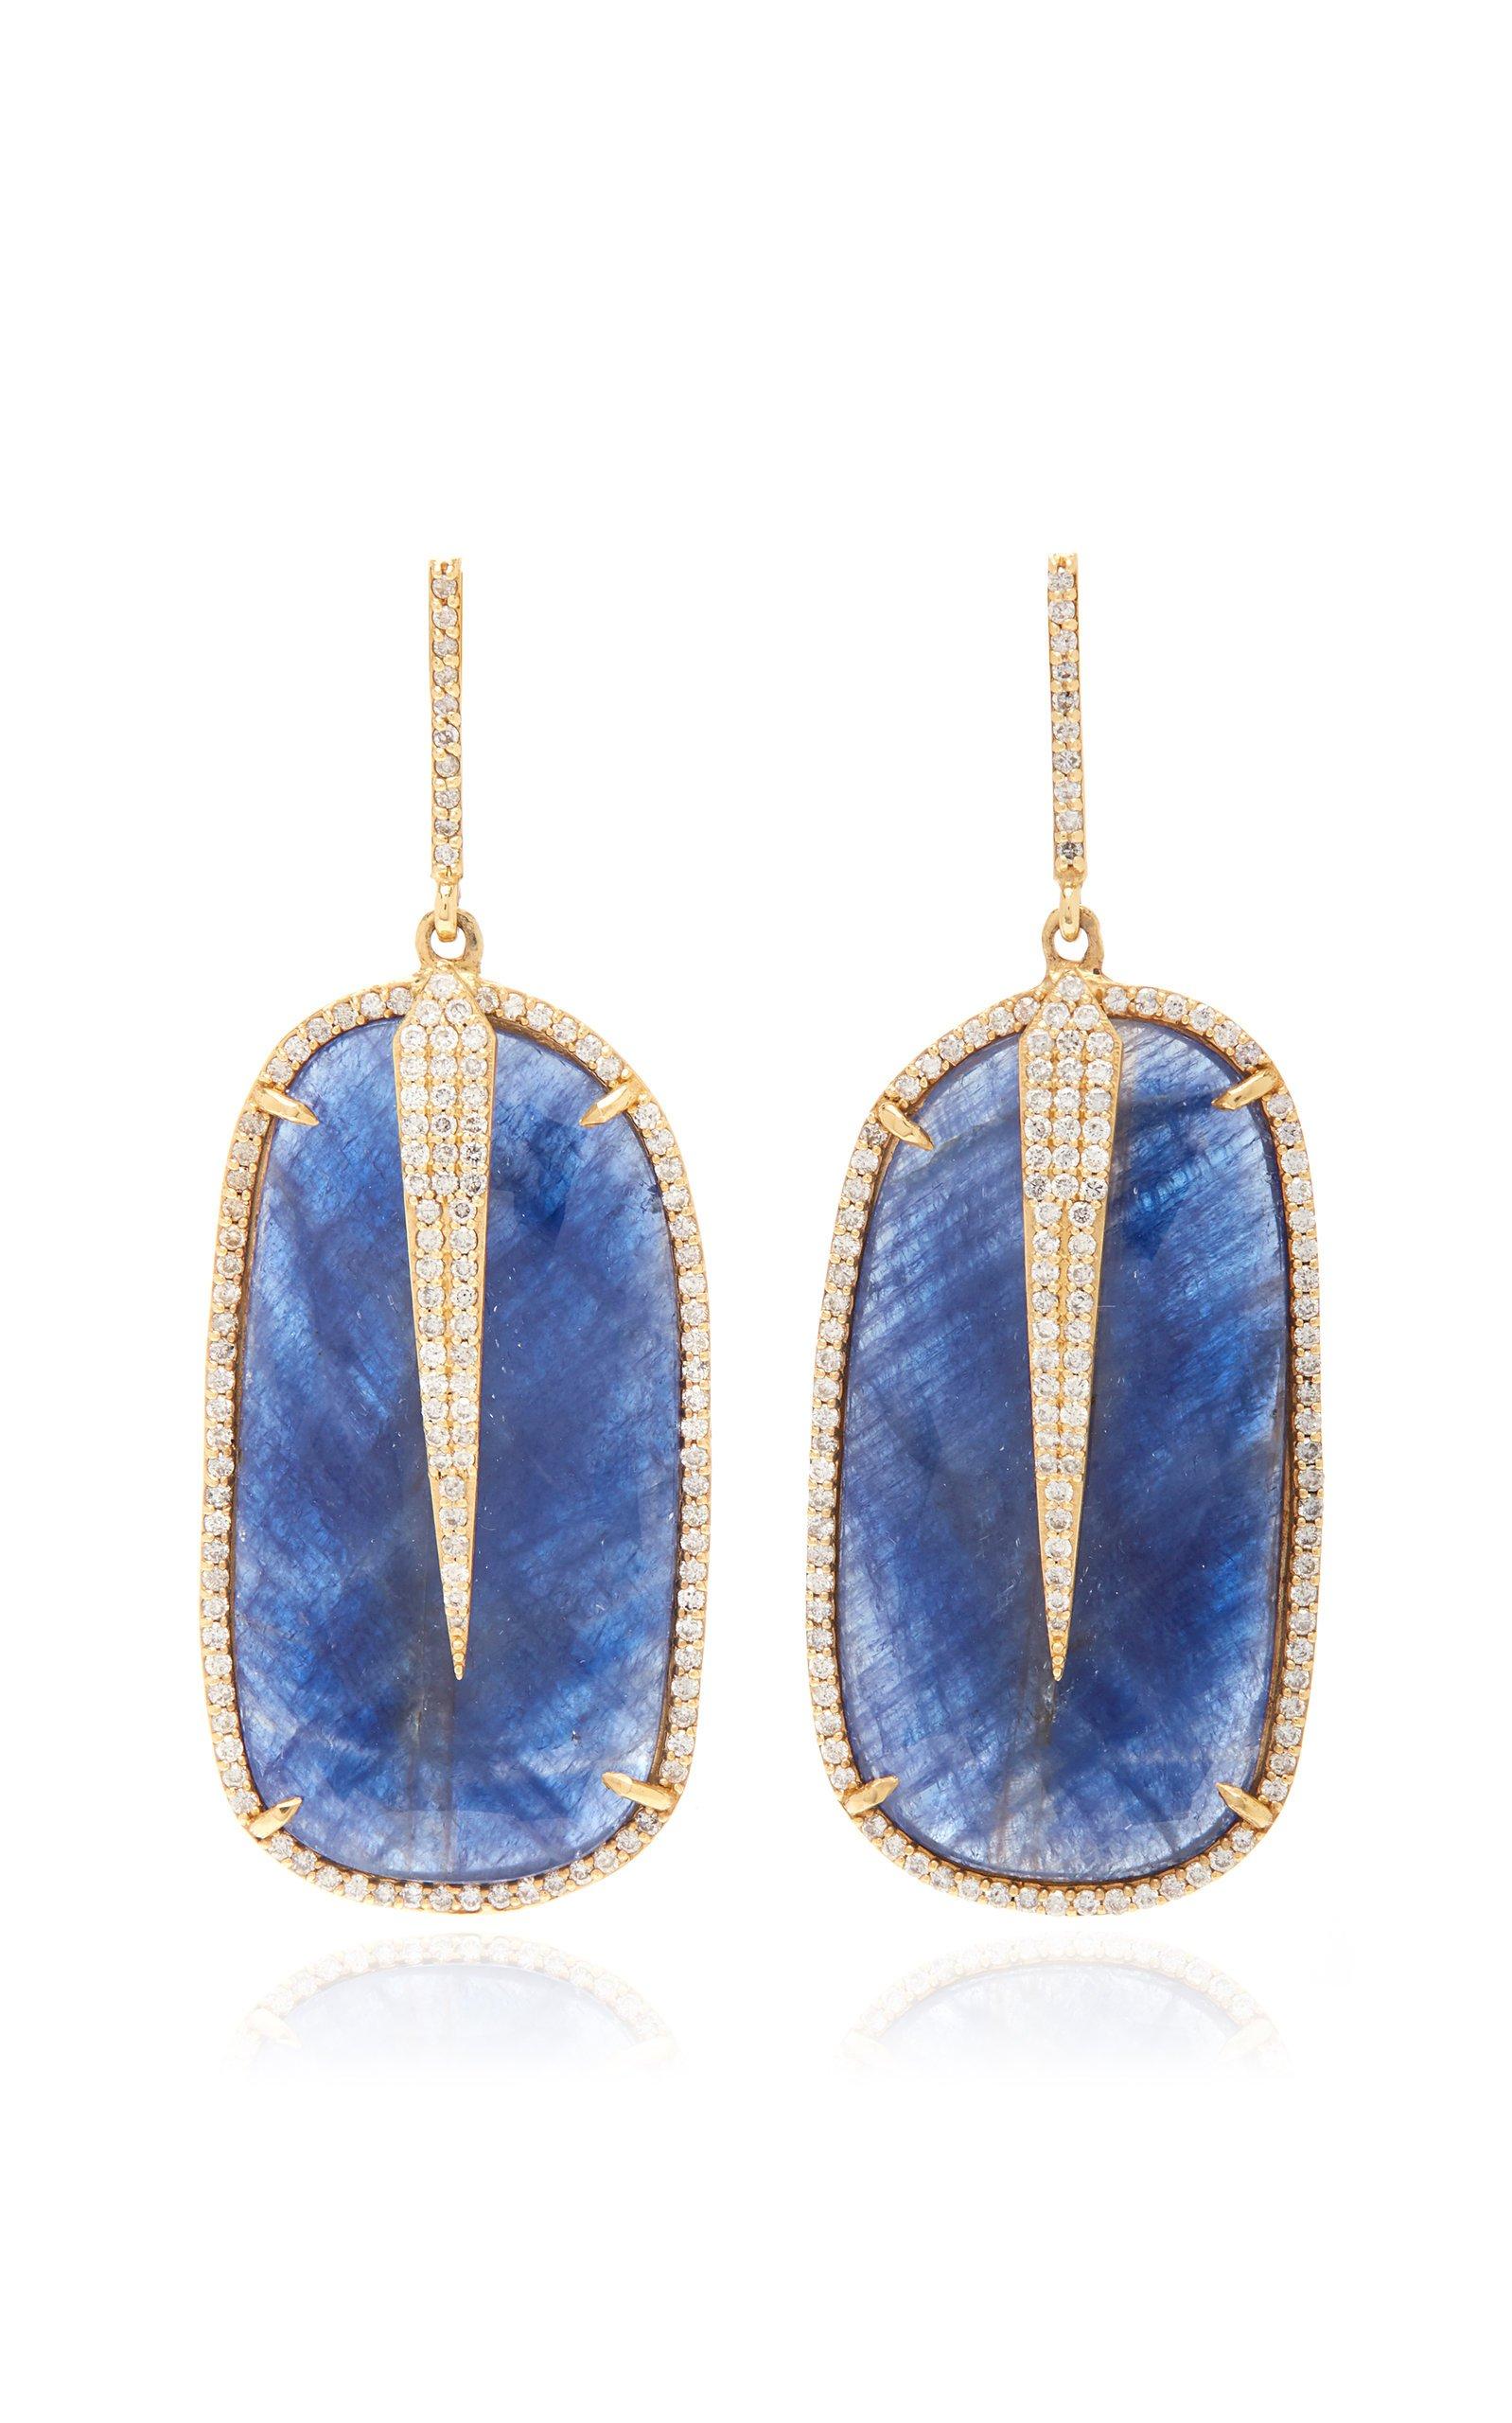 Sheryl Lowe 14K Yellow Gold Spike And Sapphire Earrings